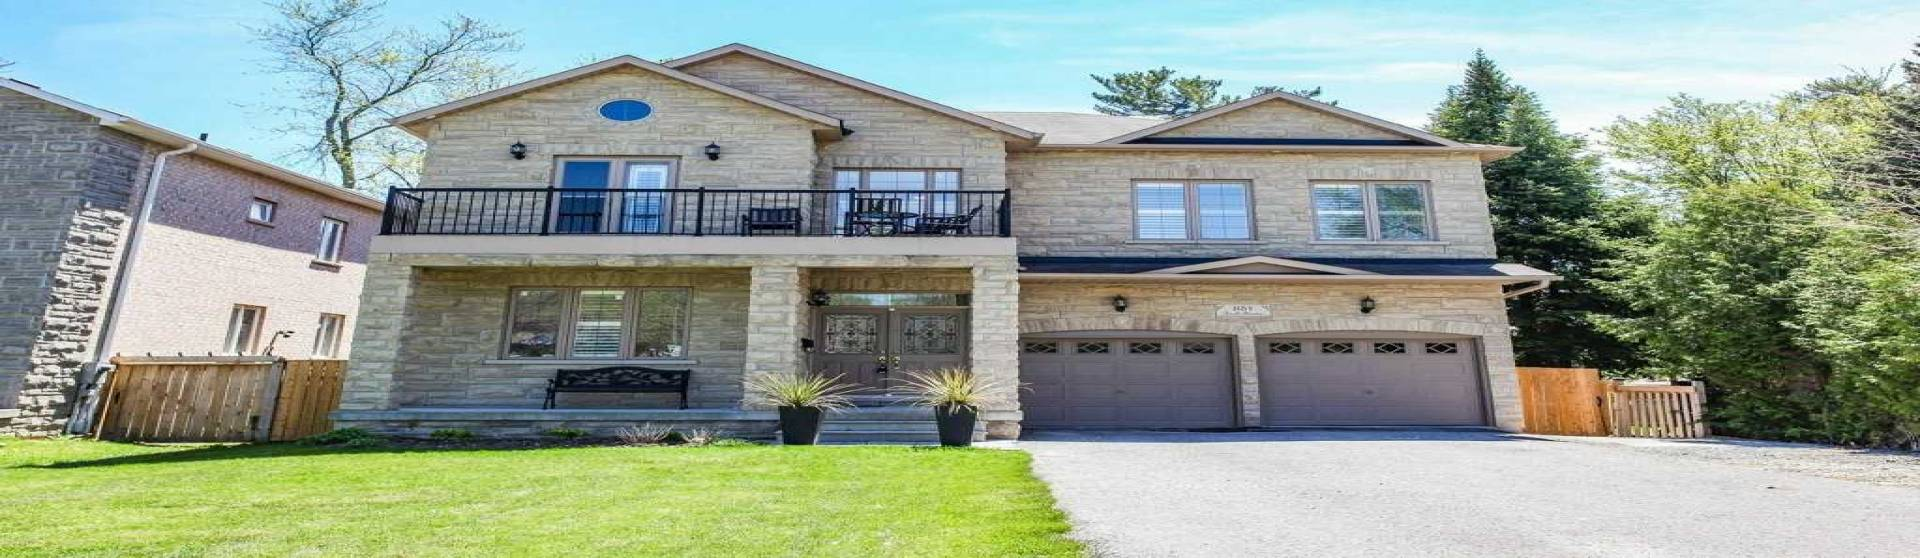 851 Finch Ave- Pickering- Ontario L1V1J4, 4 Bedrooms Bedrooms, 10 Rooms Rooms,5 BathroomsBathrooms,Detached,Sale,Finch,E4760048